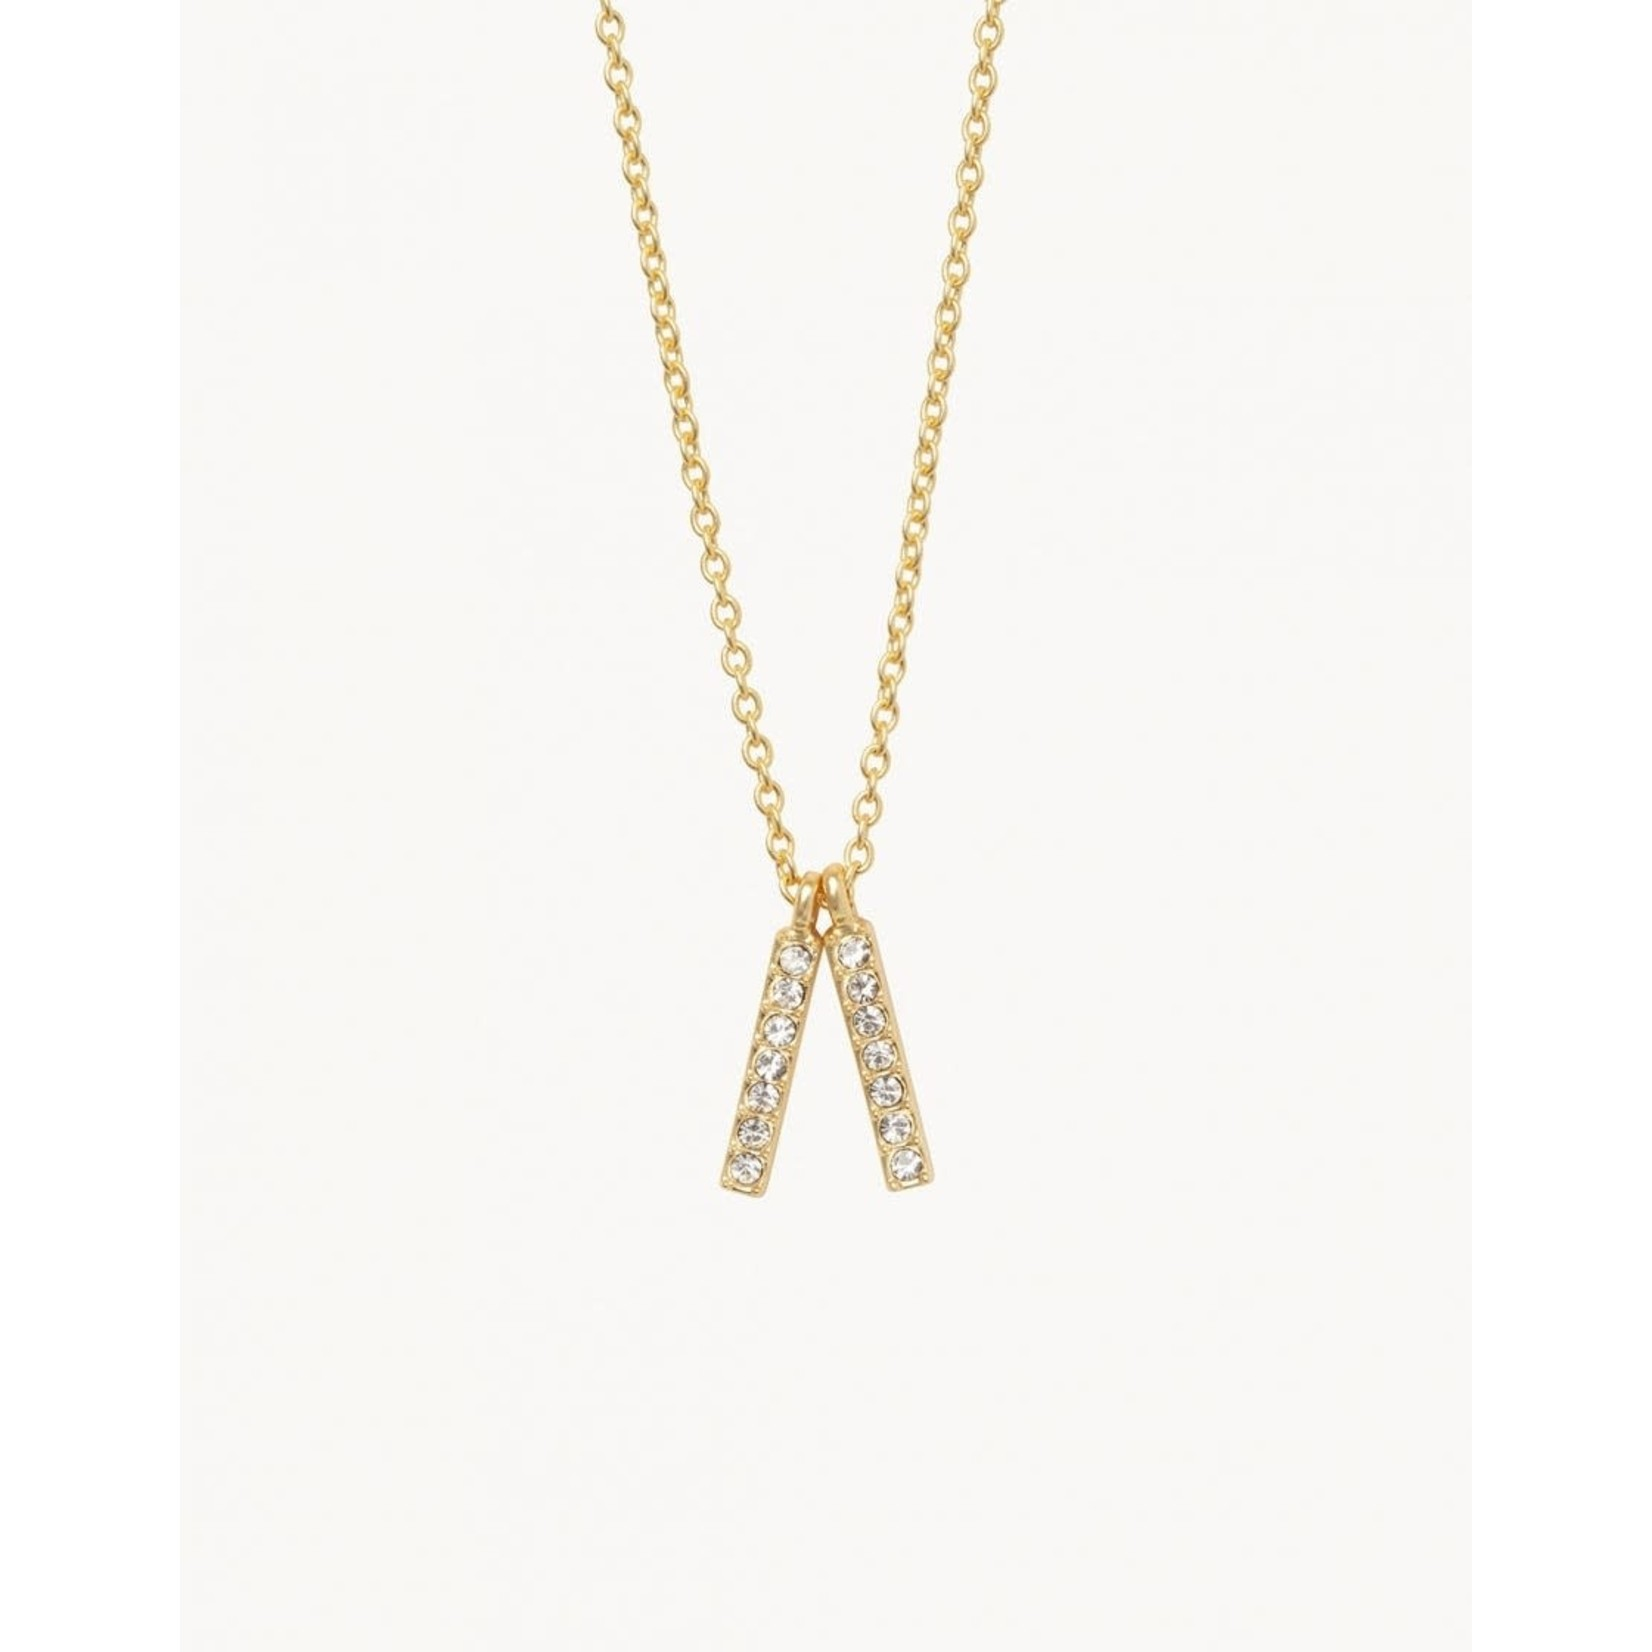 Spartina Sea La Vie Lean On Me Double Bars Necklace Gold